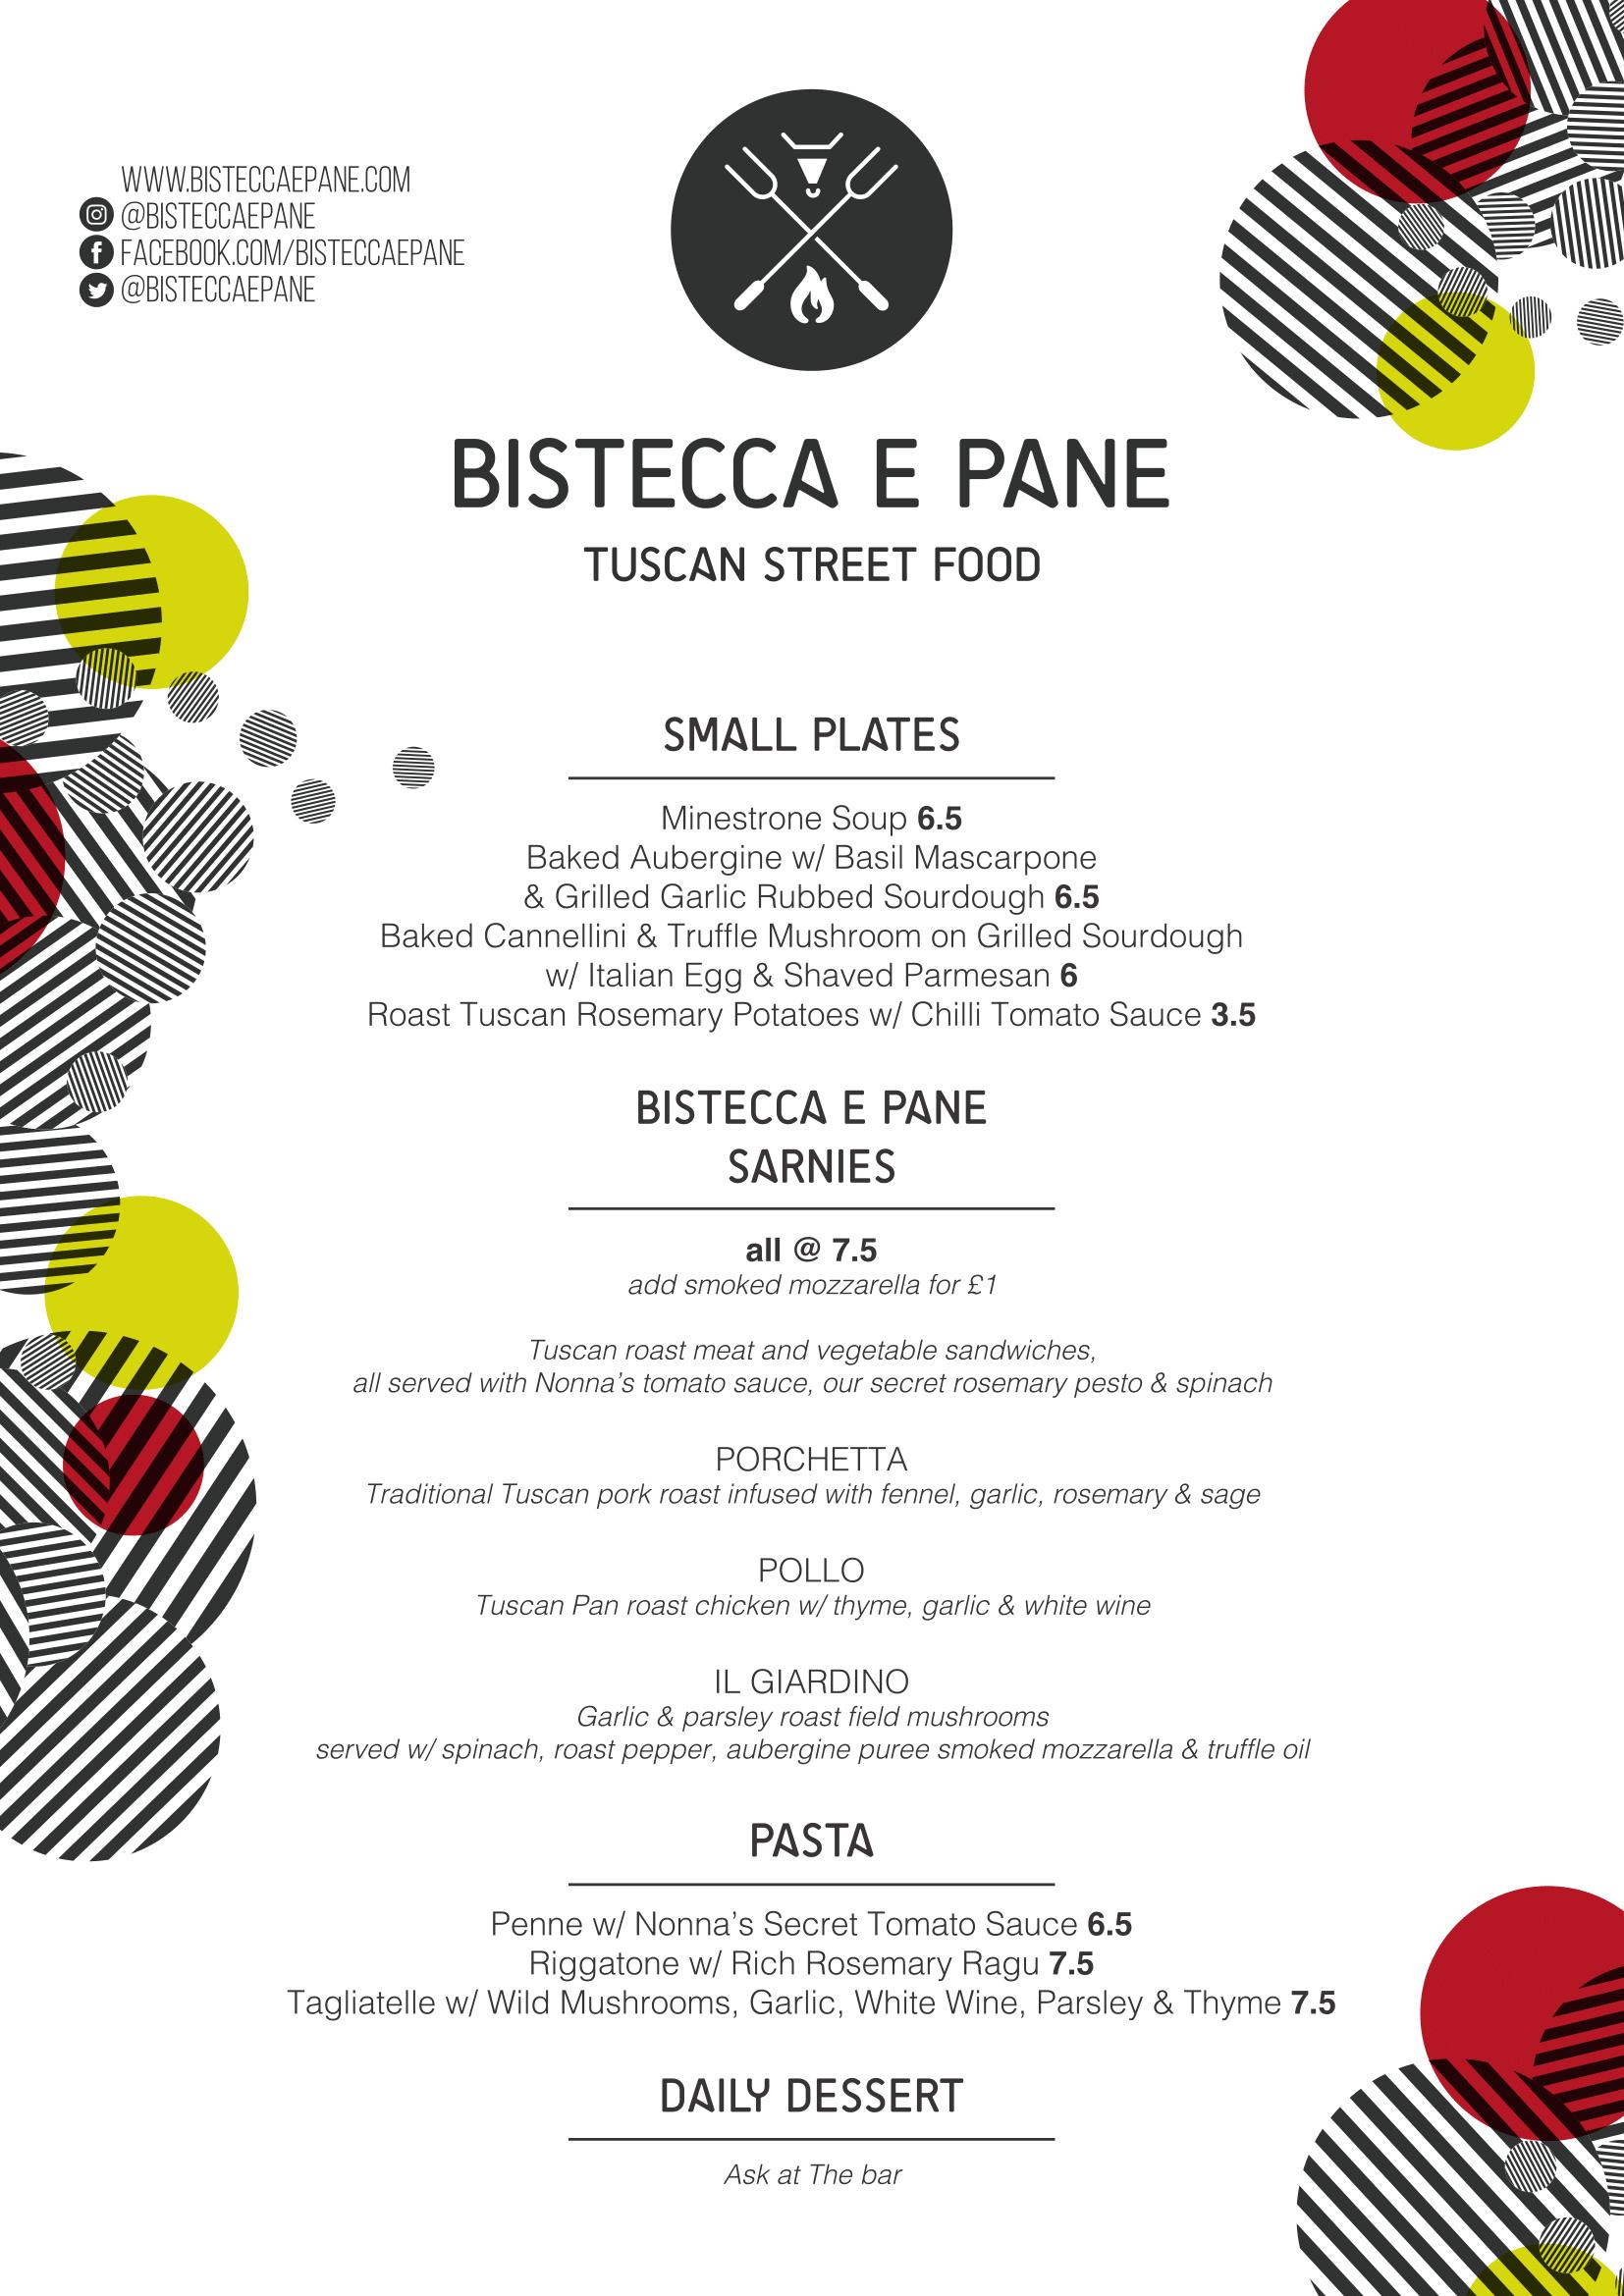 Bistecca e pane - Green rooms 2017 - menu A4_v03-1.png